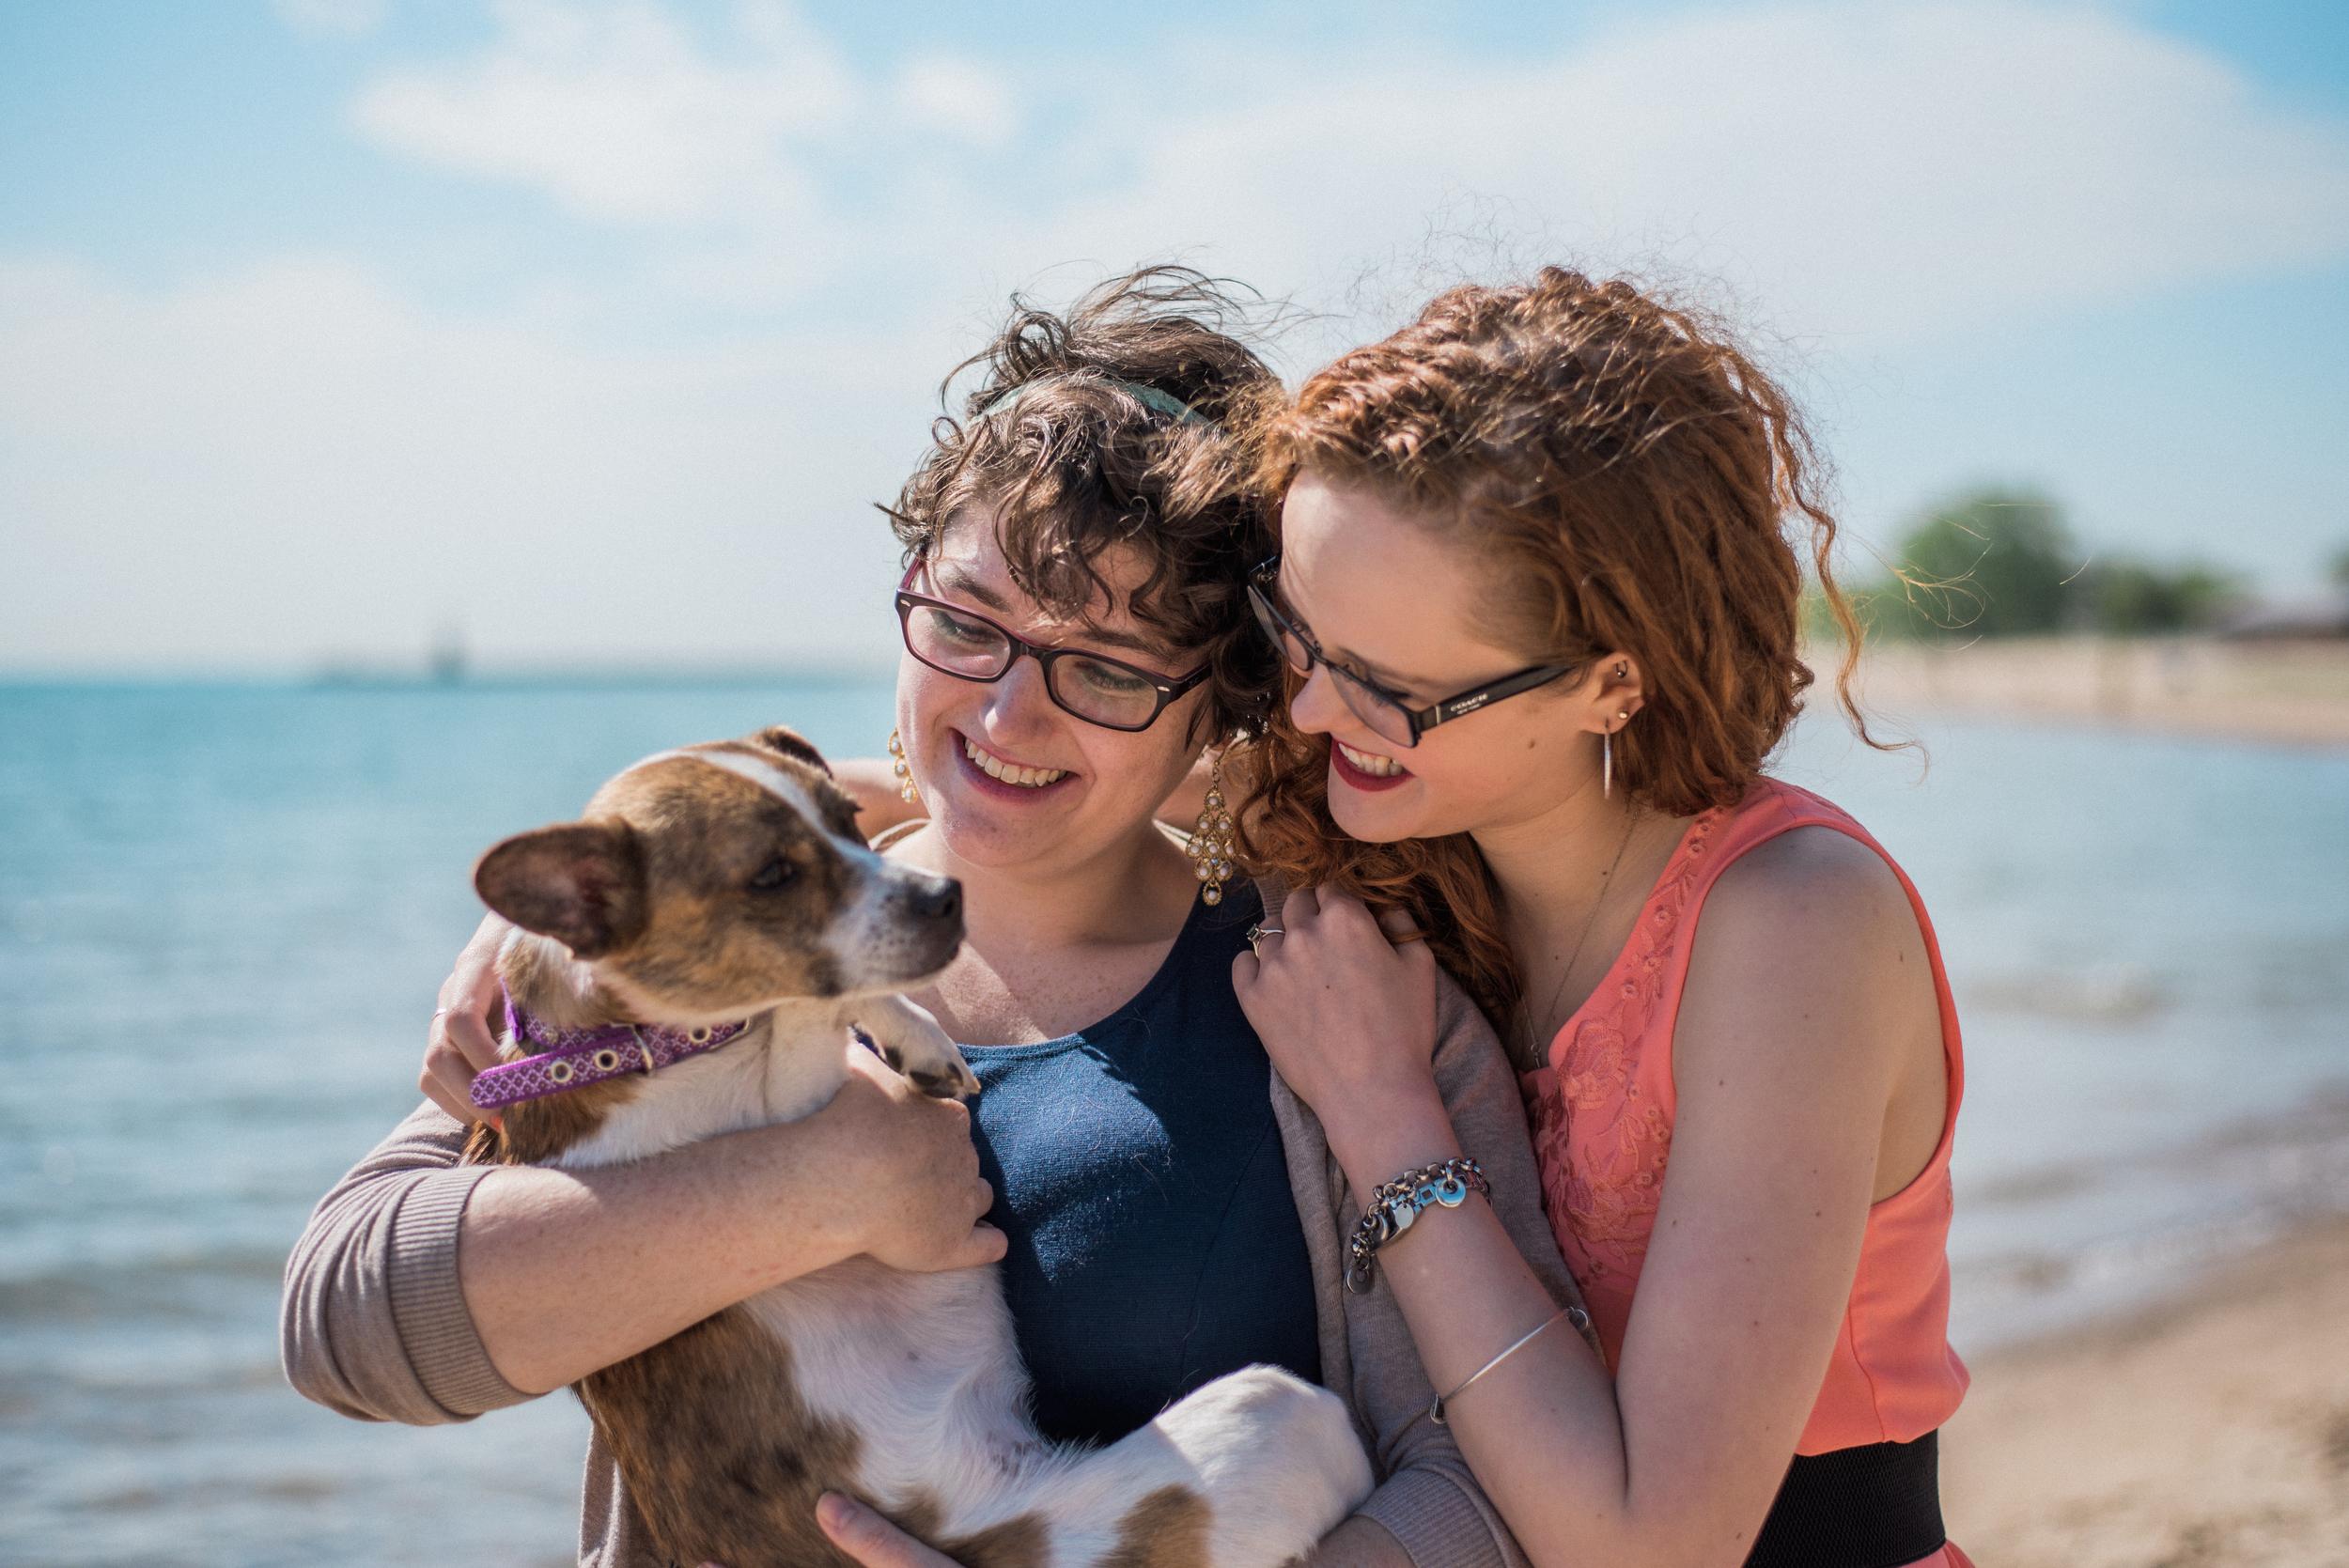 chelsea-bliefernicht-chicago-il-lane-beach-engagement-photographer